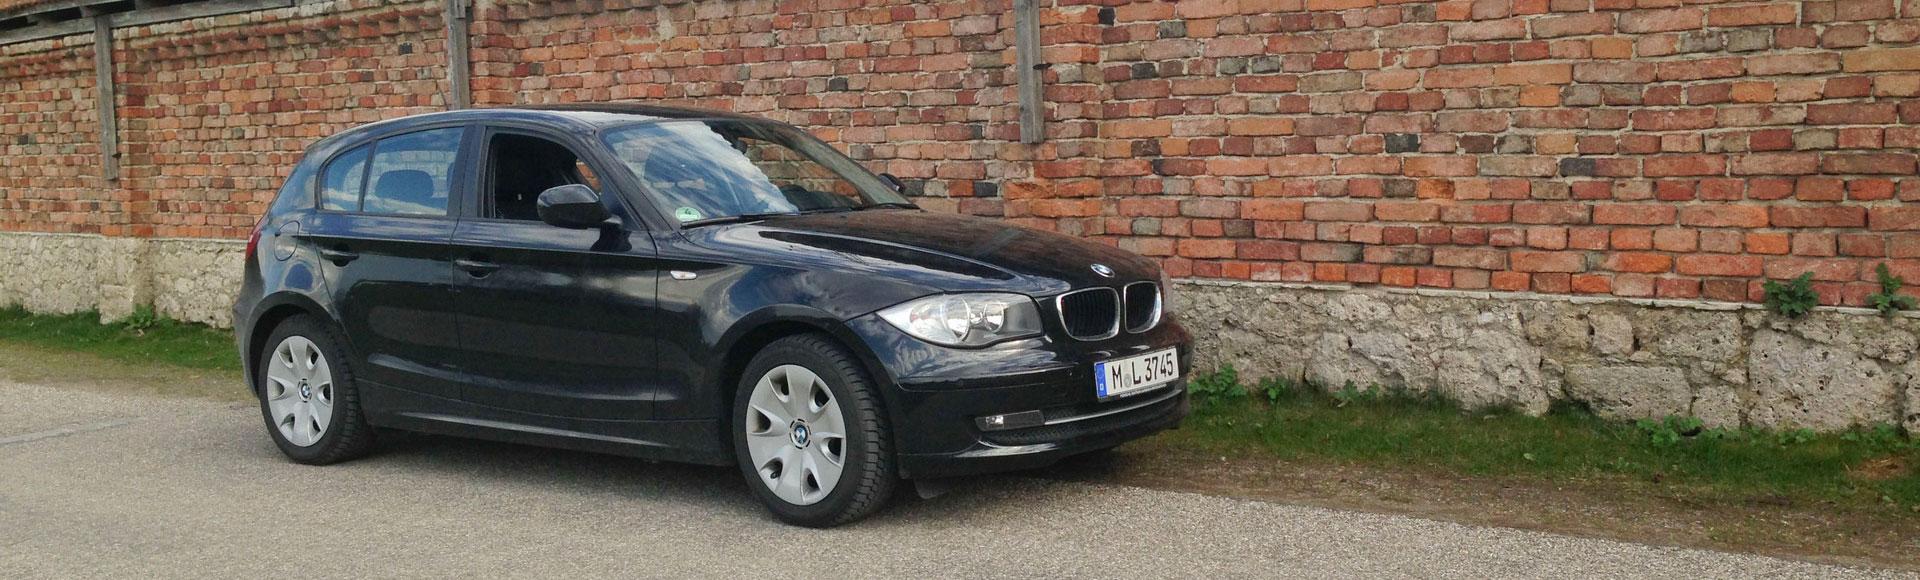 BMW 1er Diesel 2013 898